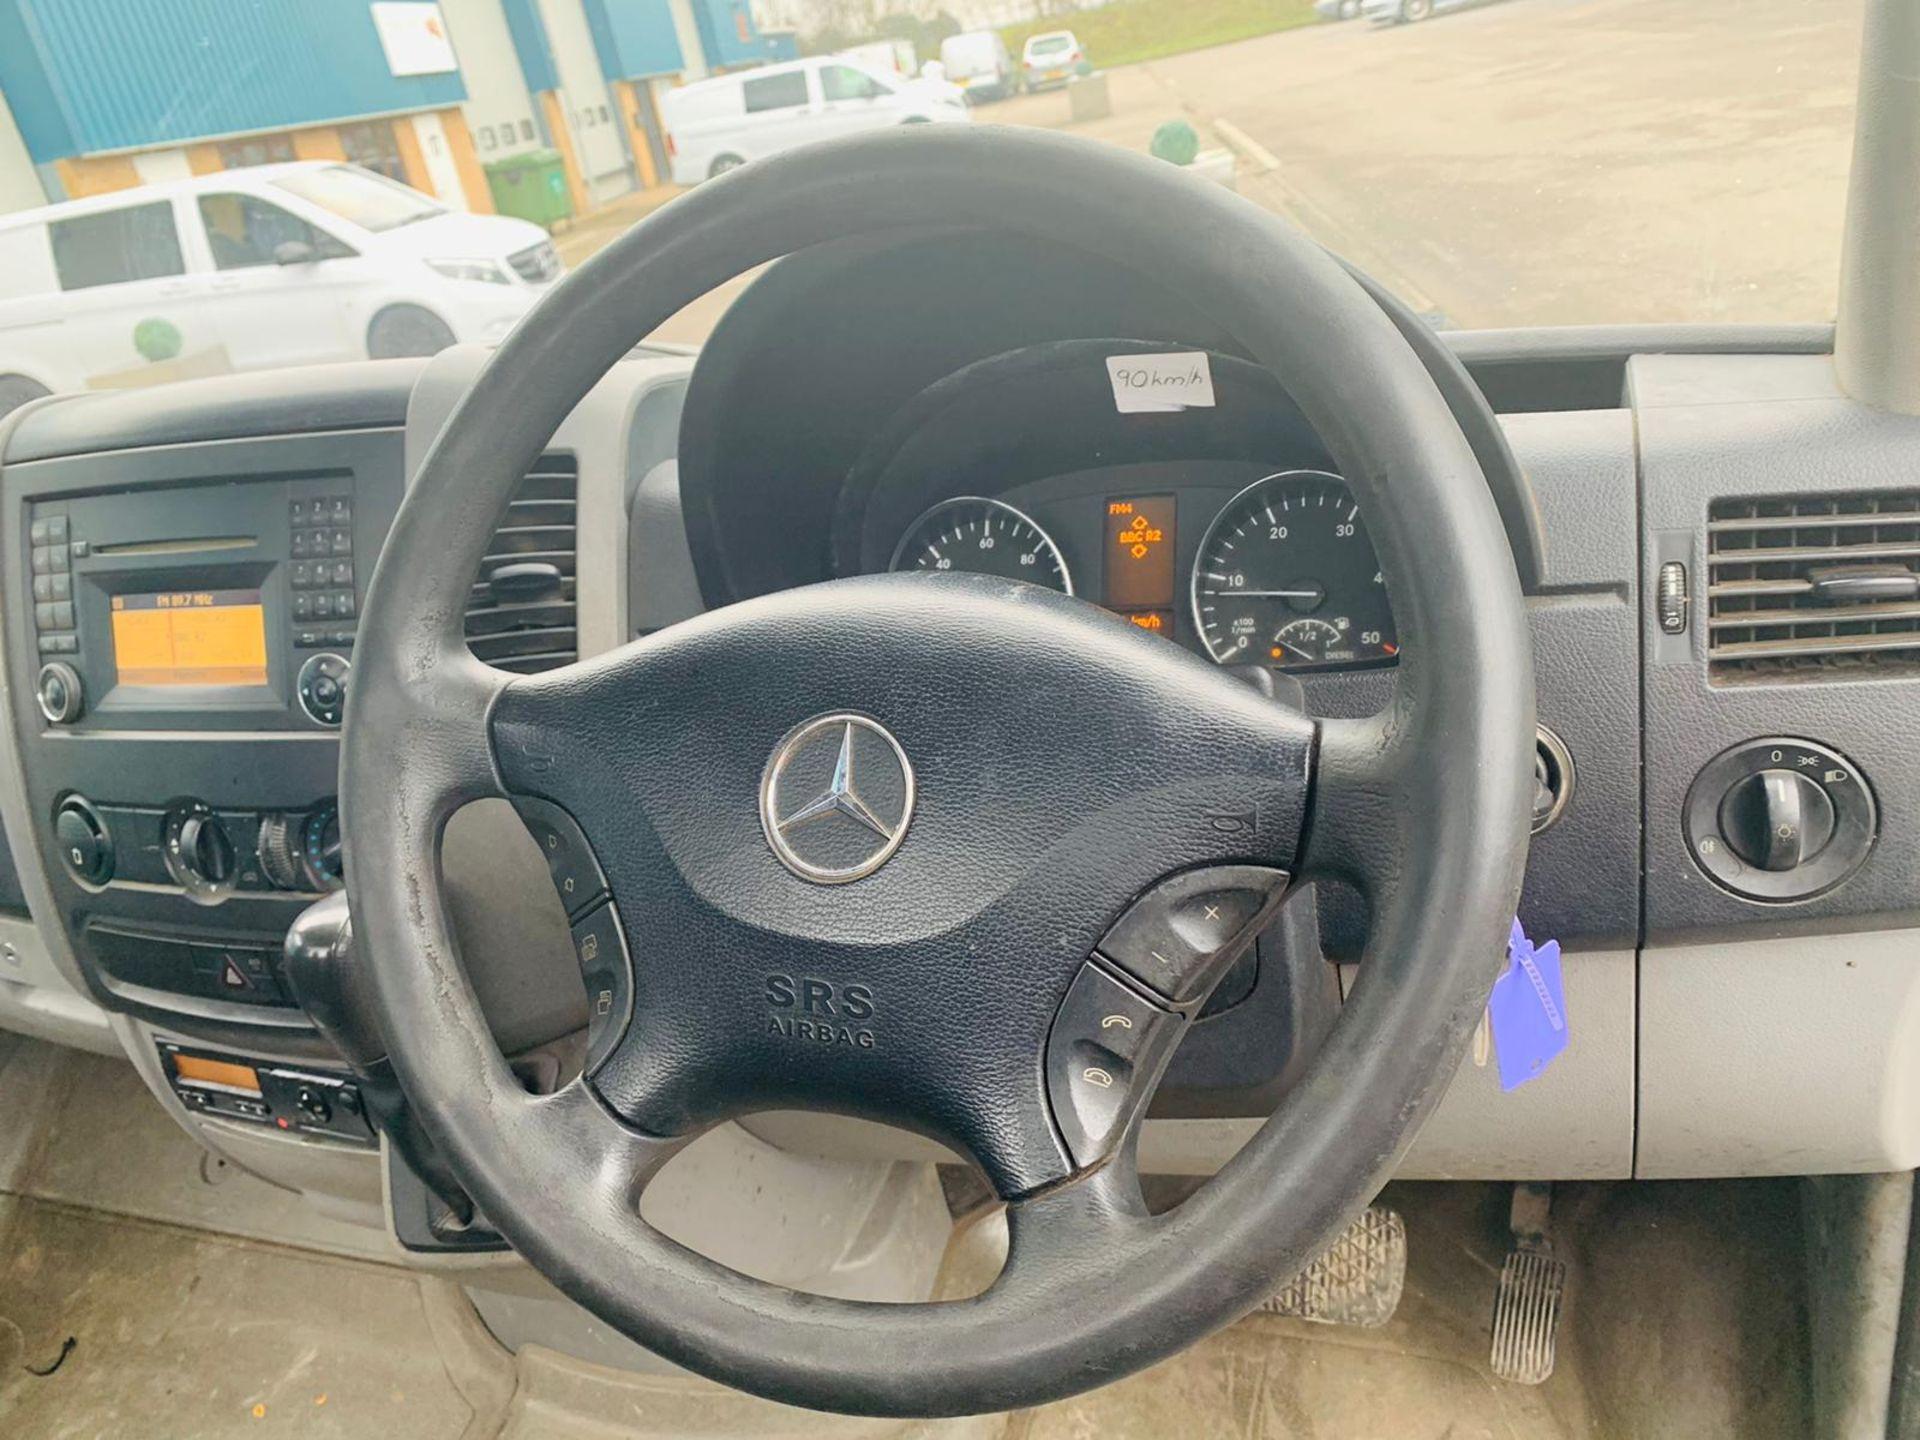 (RESERVE MET) Mercedes Sprinter 516CDI (160 BHP) XLWB 20ft Flatbed Body - 6 Speed - 2013 13 Reg - - Image 14 of 15